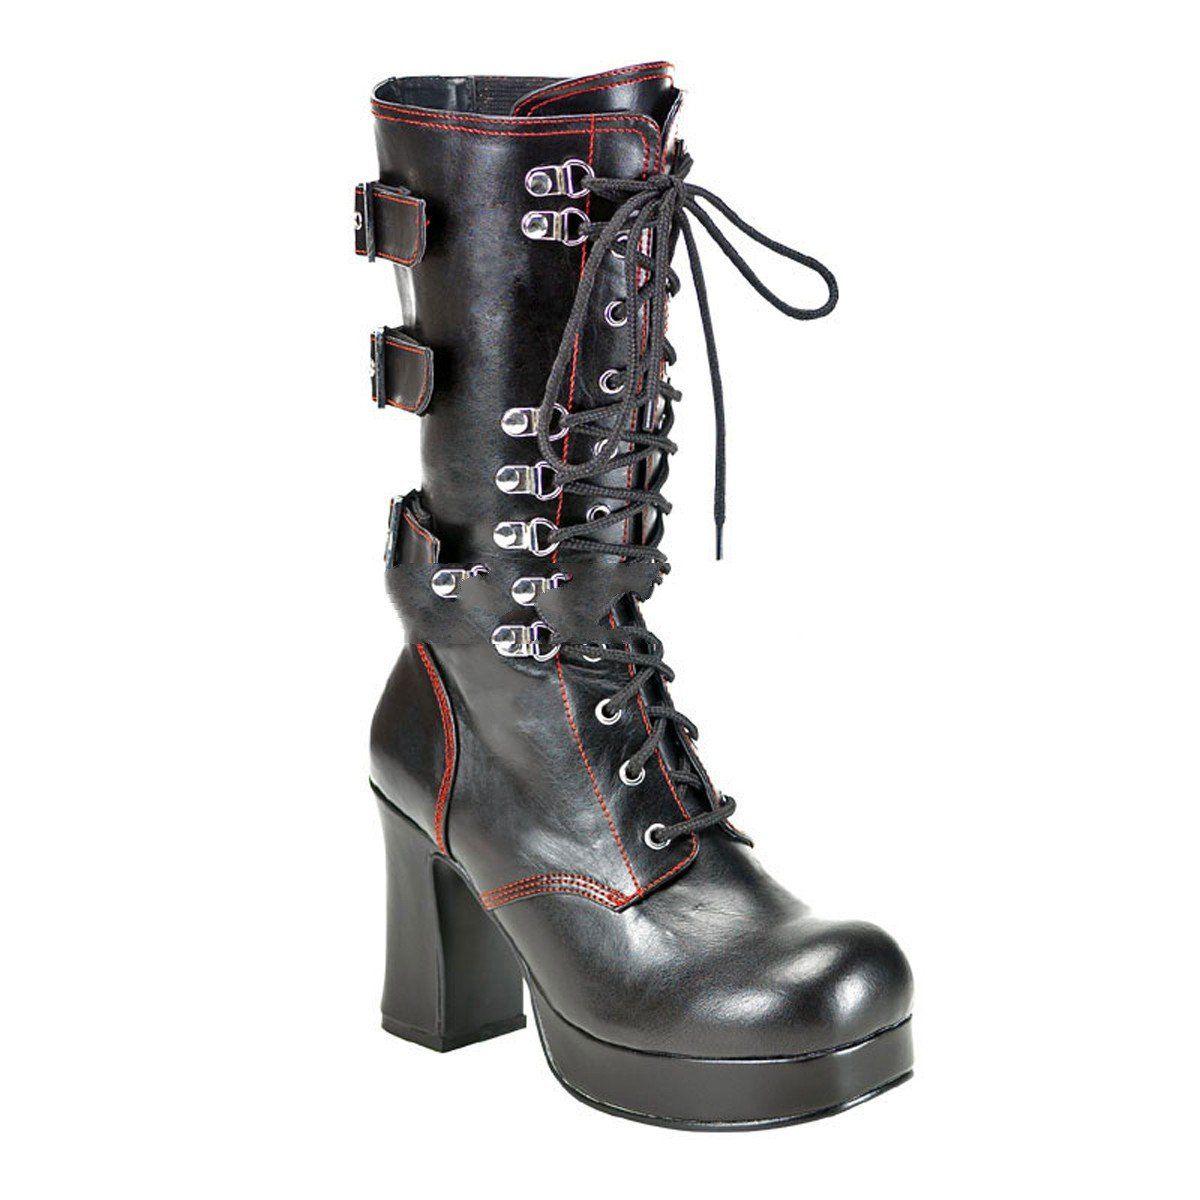 Demonia Slush-249 - sexy Gothic Industrial Plateau Stiefel Schuhe 36-45, Größe:EU-38 / US-8 / UK-5